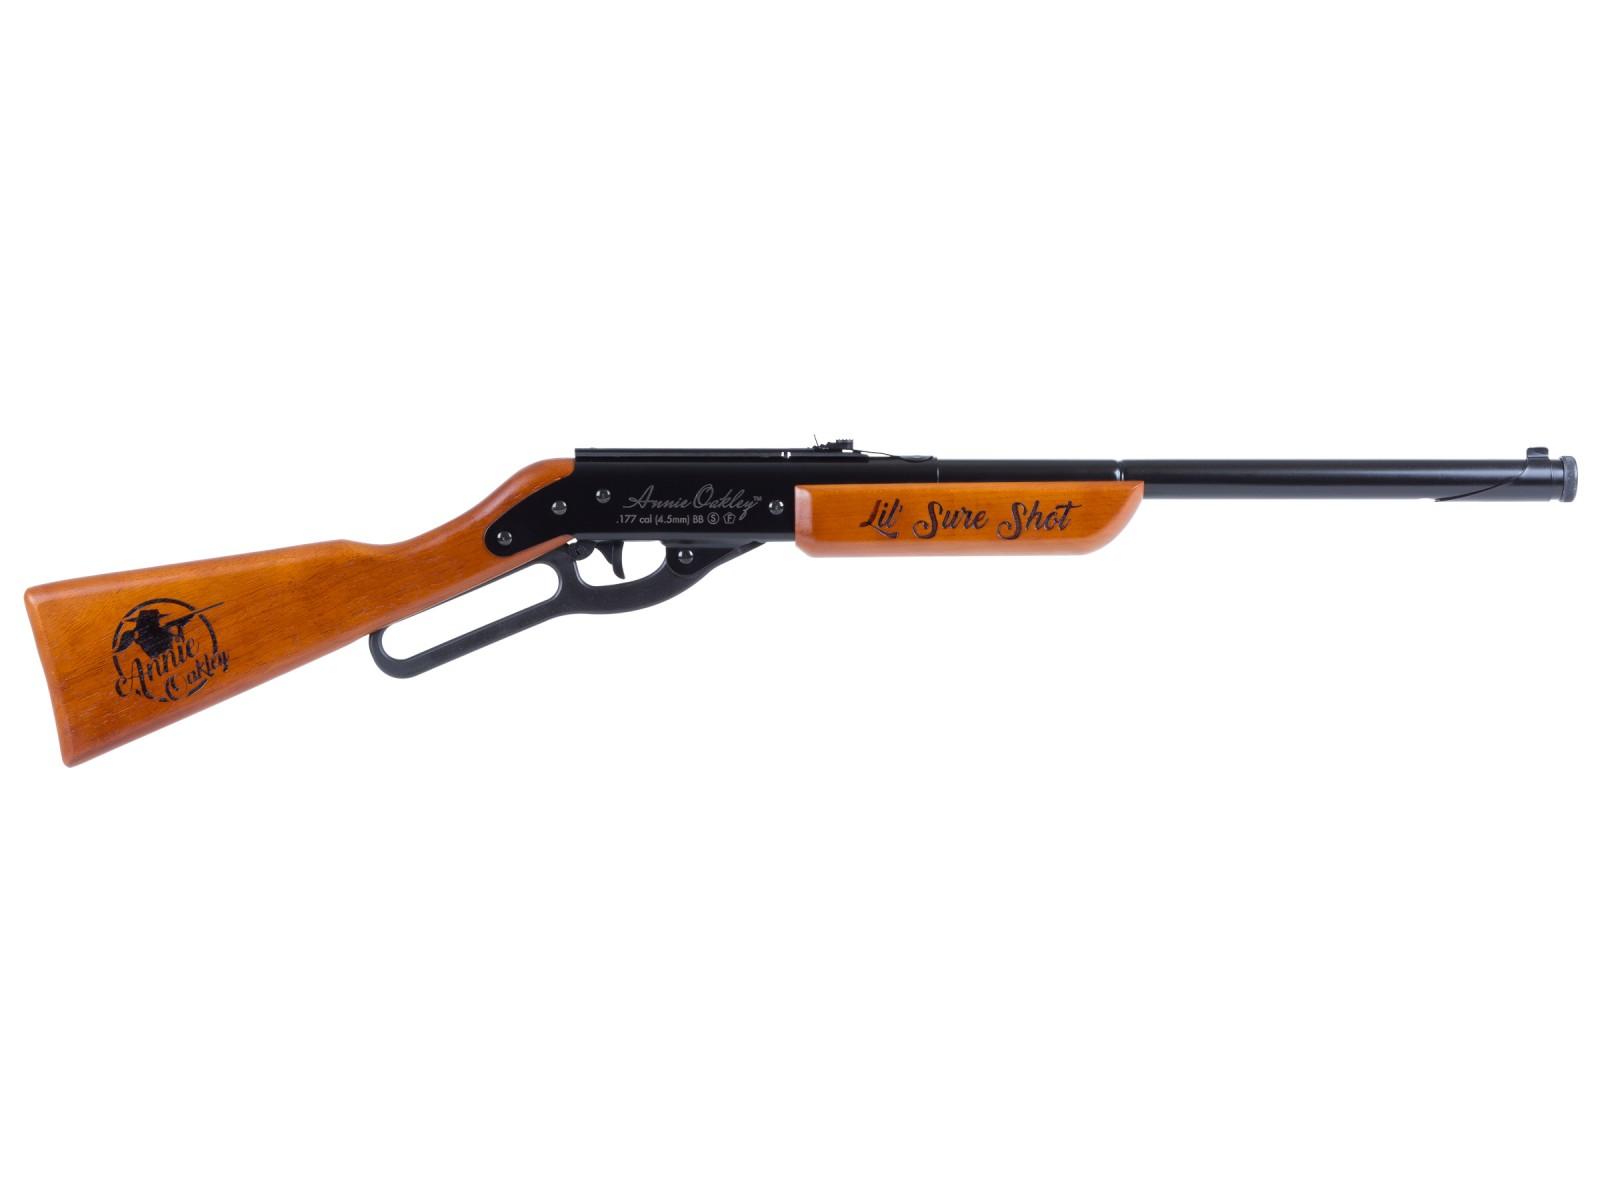 Annie Oakley Lil Sure Shot BB Rifle